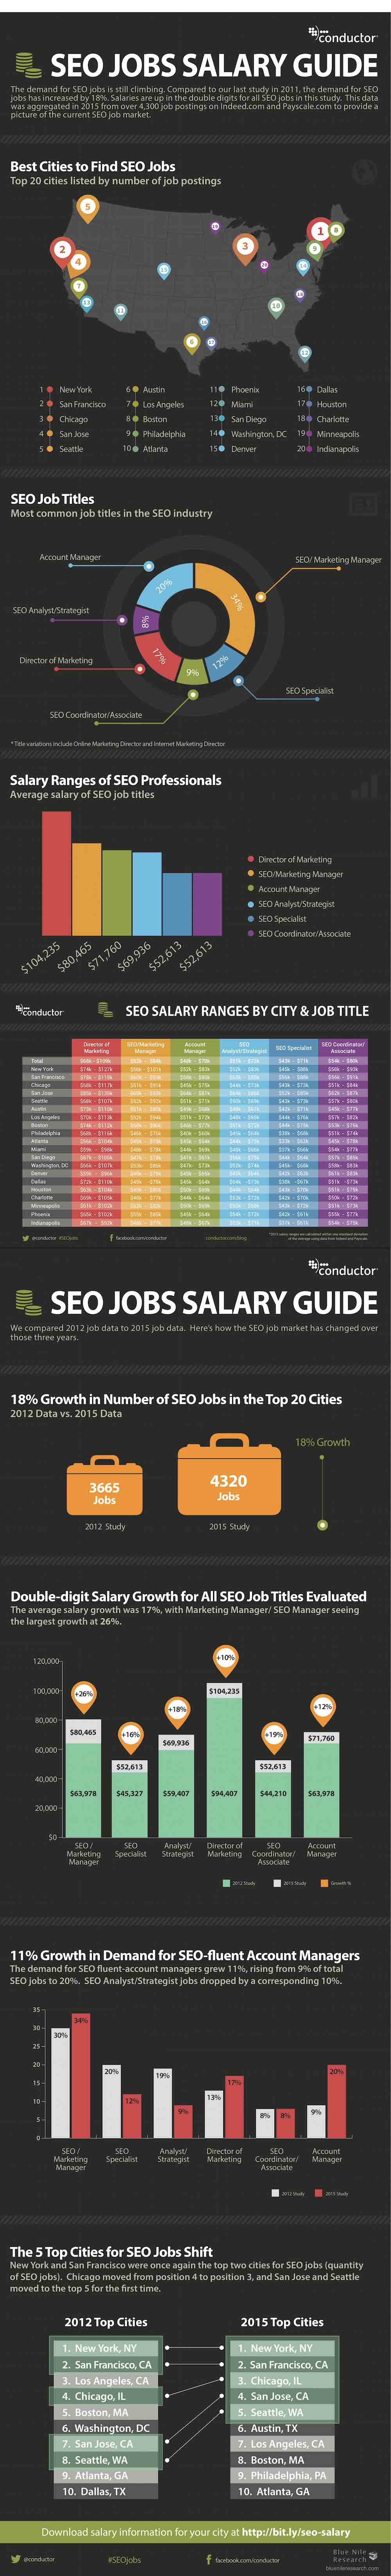 SEO Jobs Salary Guide